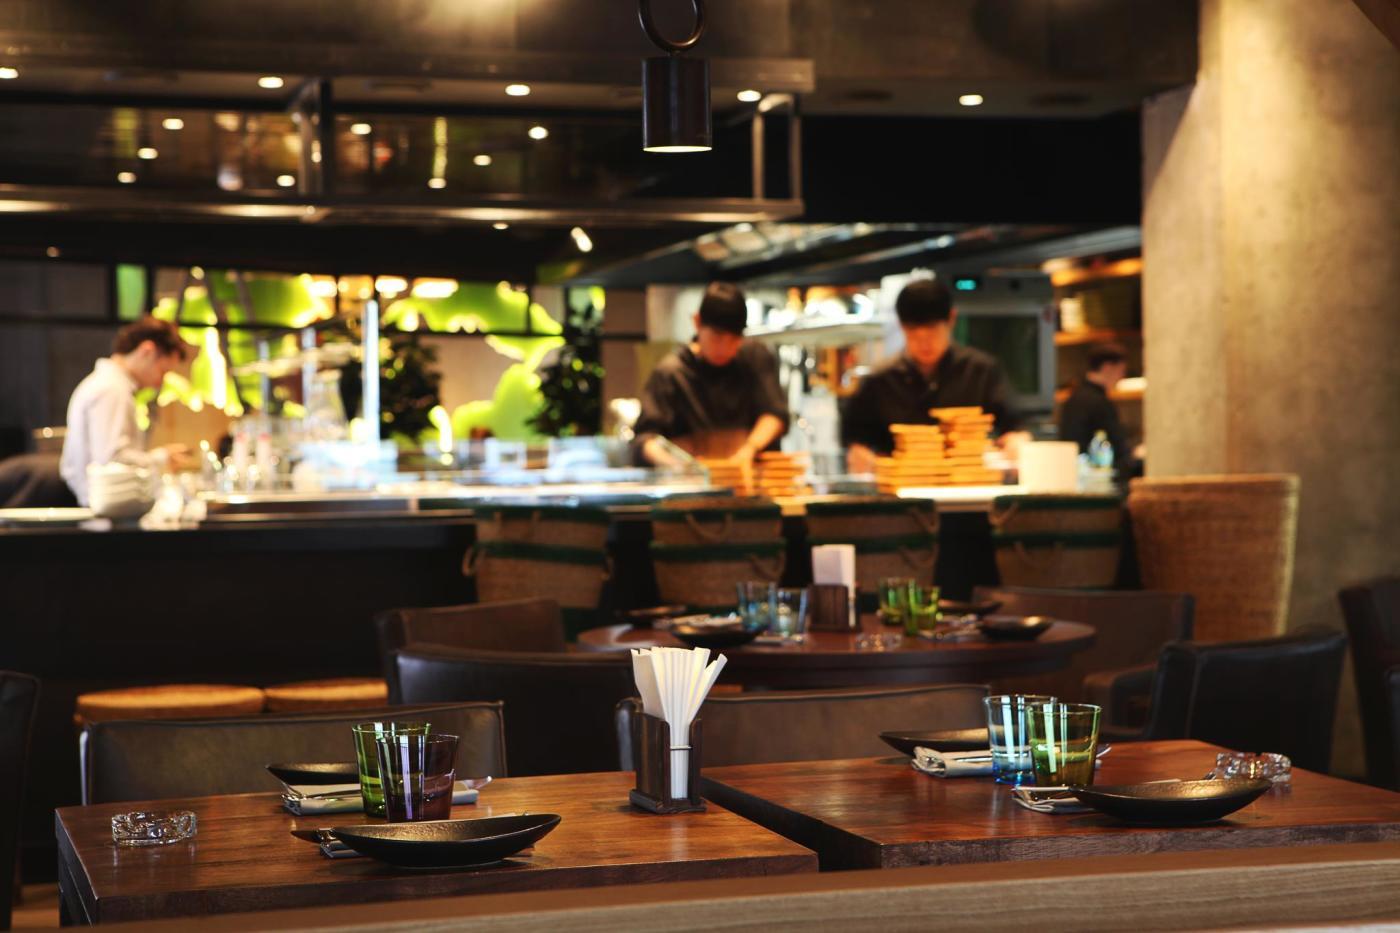 Ресторан Страна, которой нет фото 9